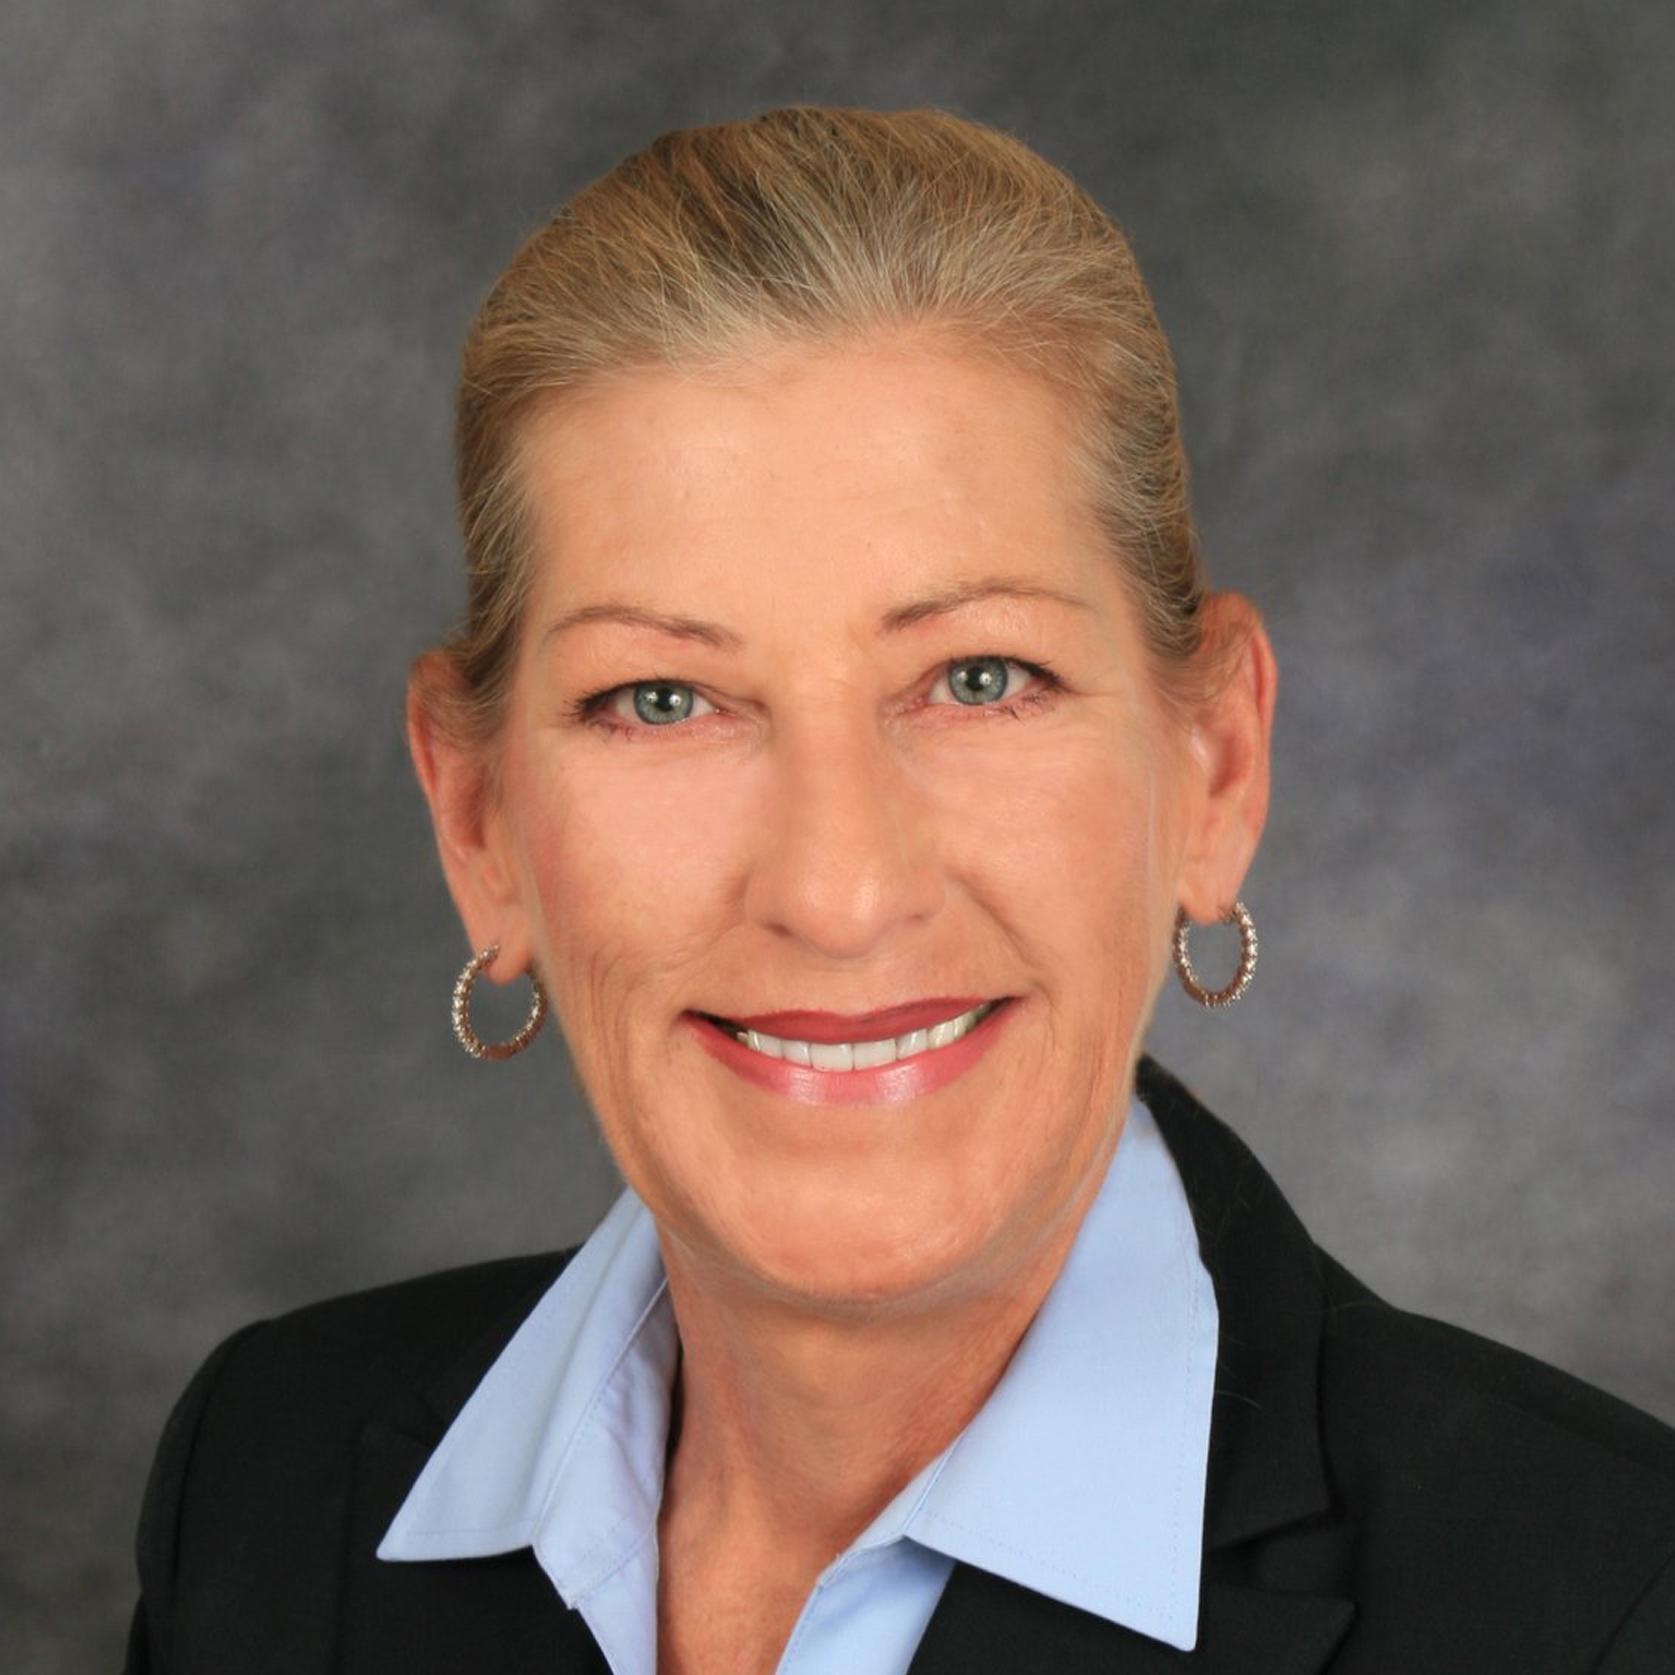 Rhonda Eaton for District 2 Commissioner